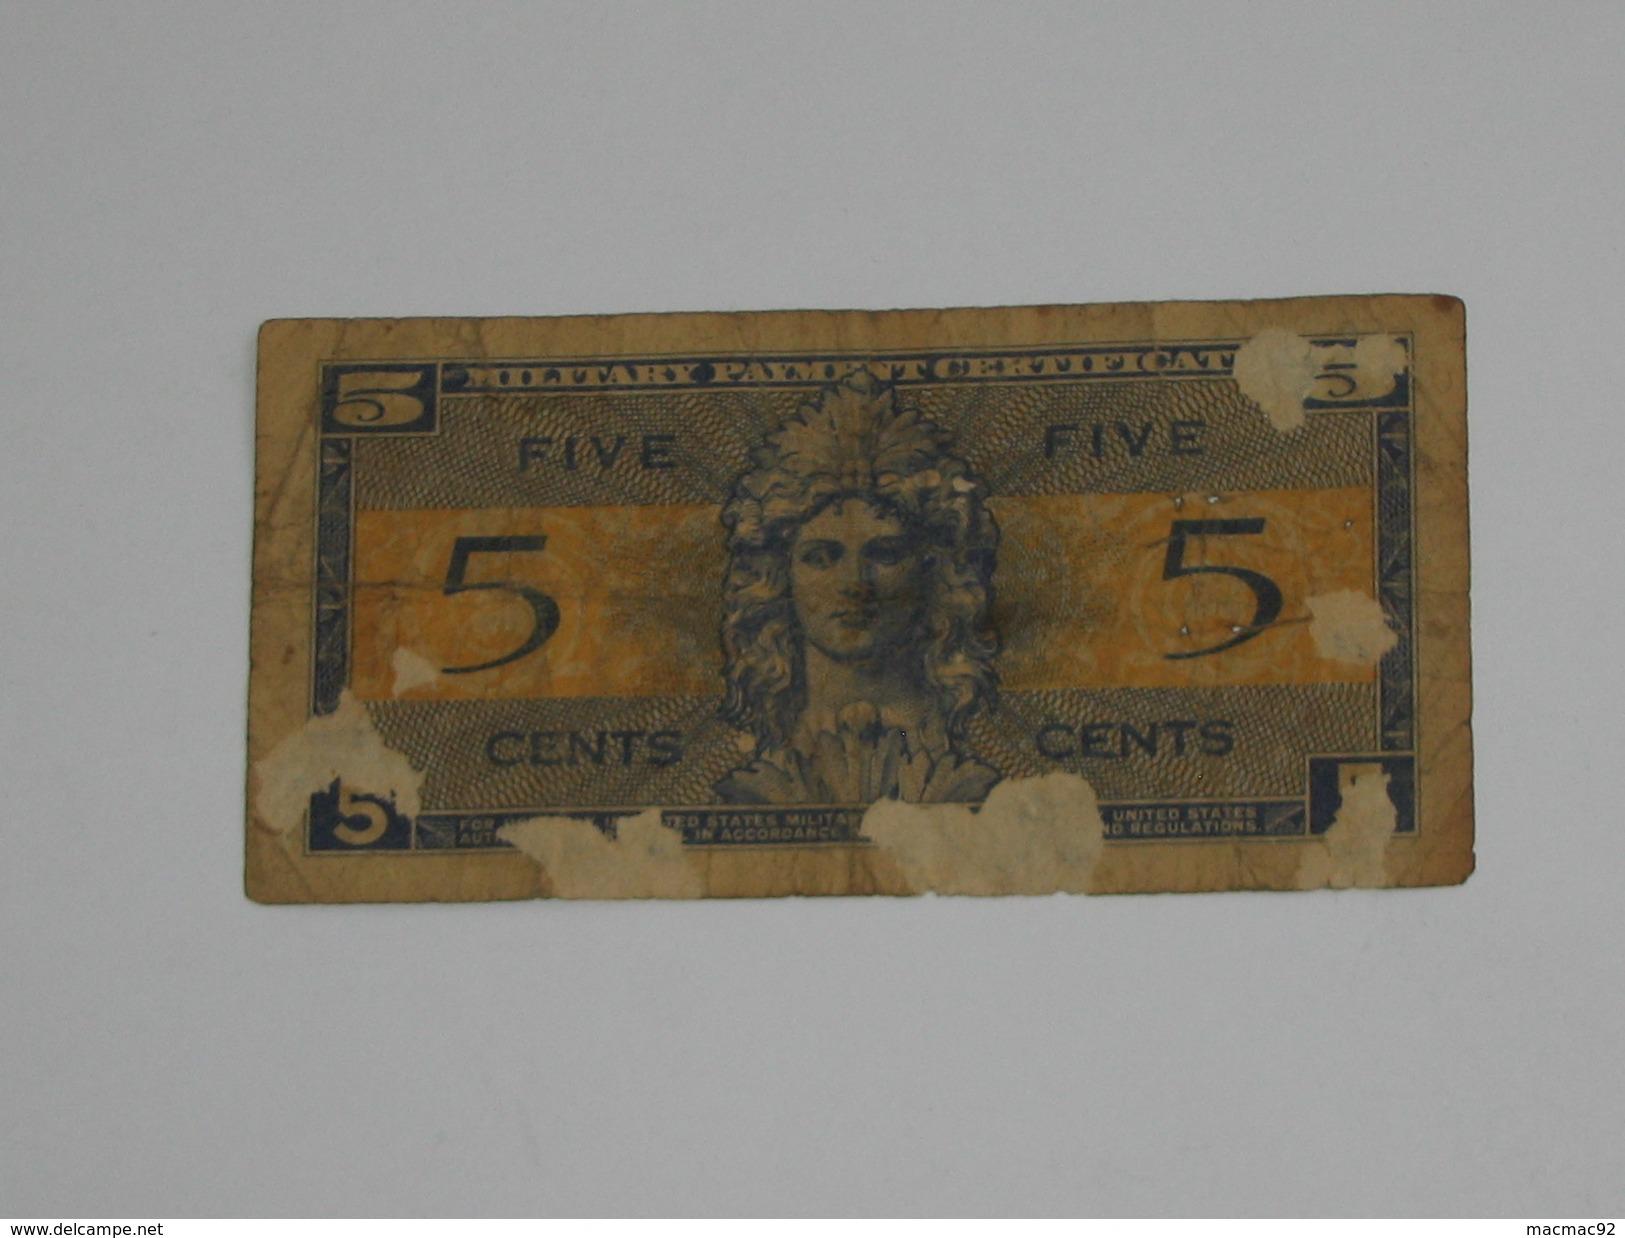 5 Five Cents Série 521 Miltary Payment Certificate 1954-1958 *** EN ACHAT IMMEDIAT *** - 1954-1958 - Reeksen 521